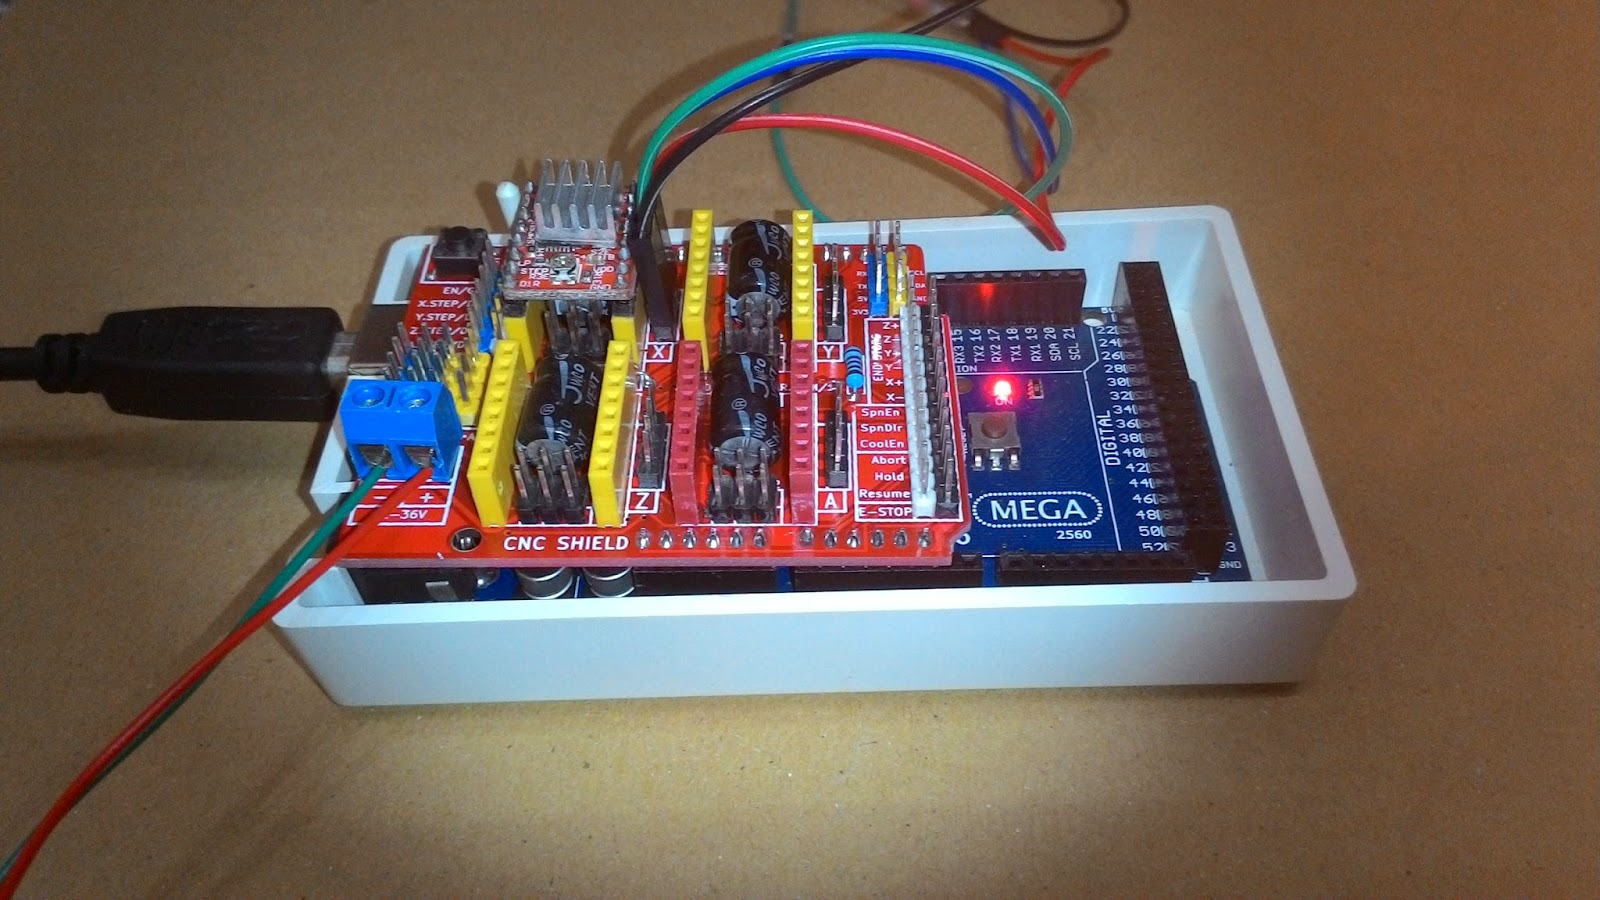 camera slider dolly makerslide arduino cnc shield a4988 driver 42bygh4417 [ 1600 x 900 Pixel ]